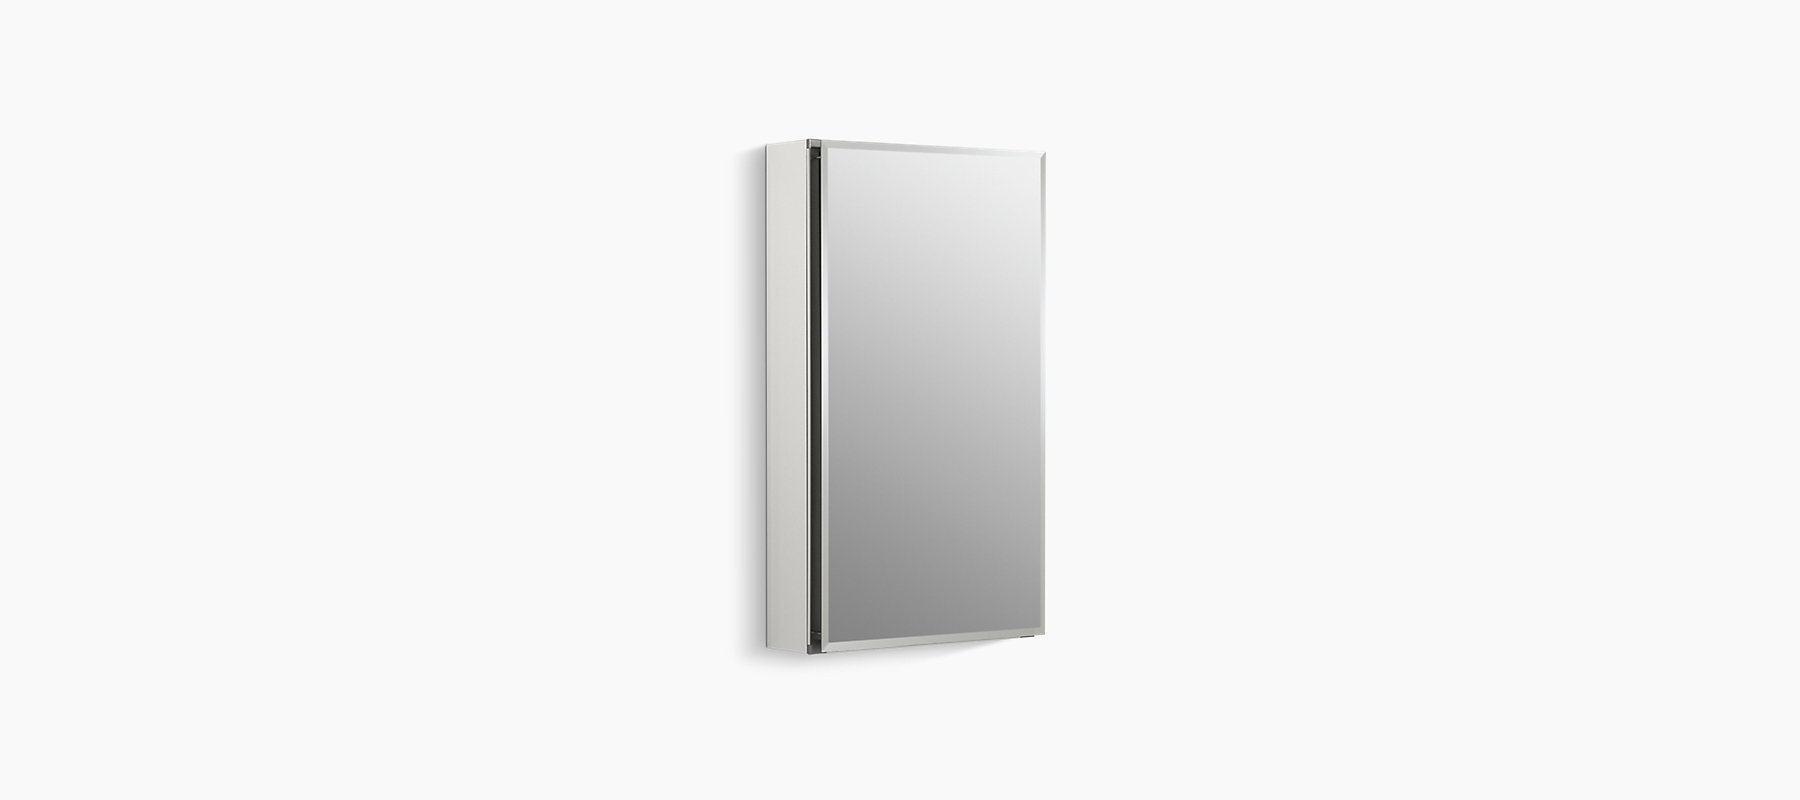 15-Inch Medicine Cabinet With Mirrored Door